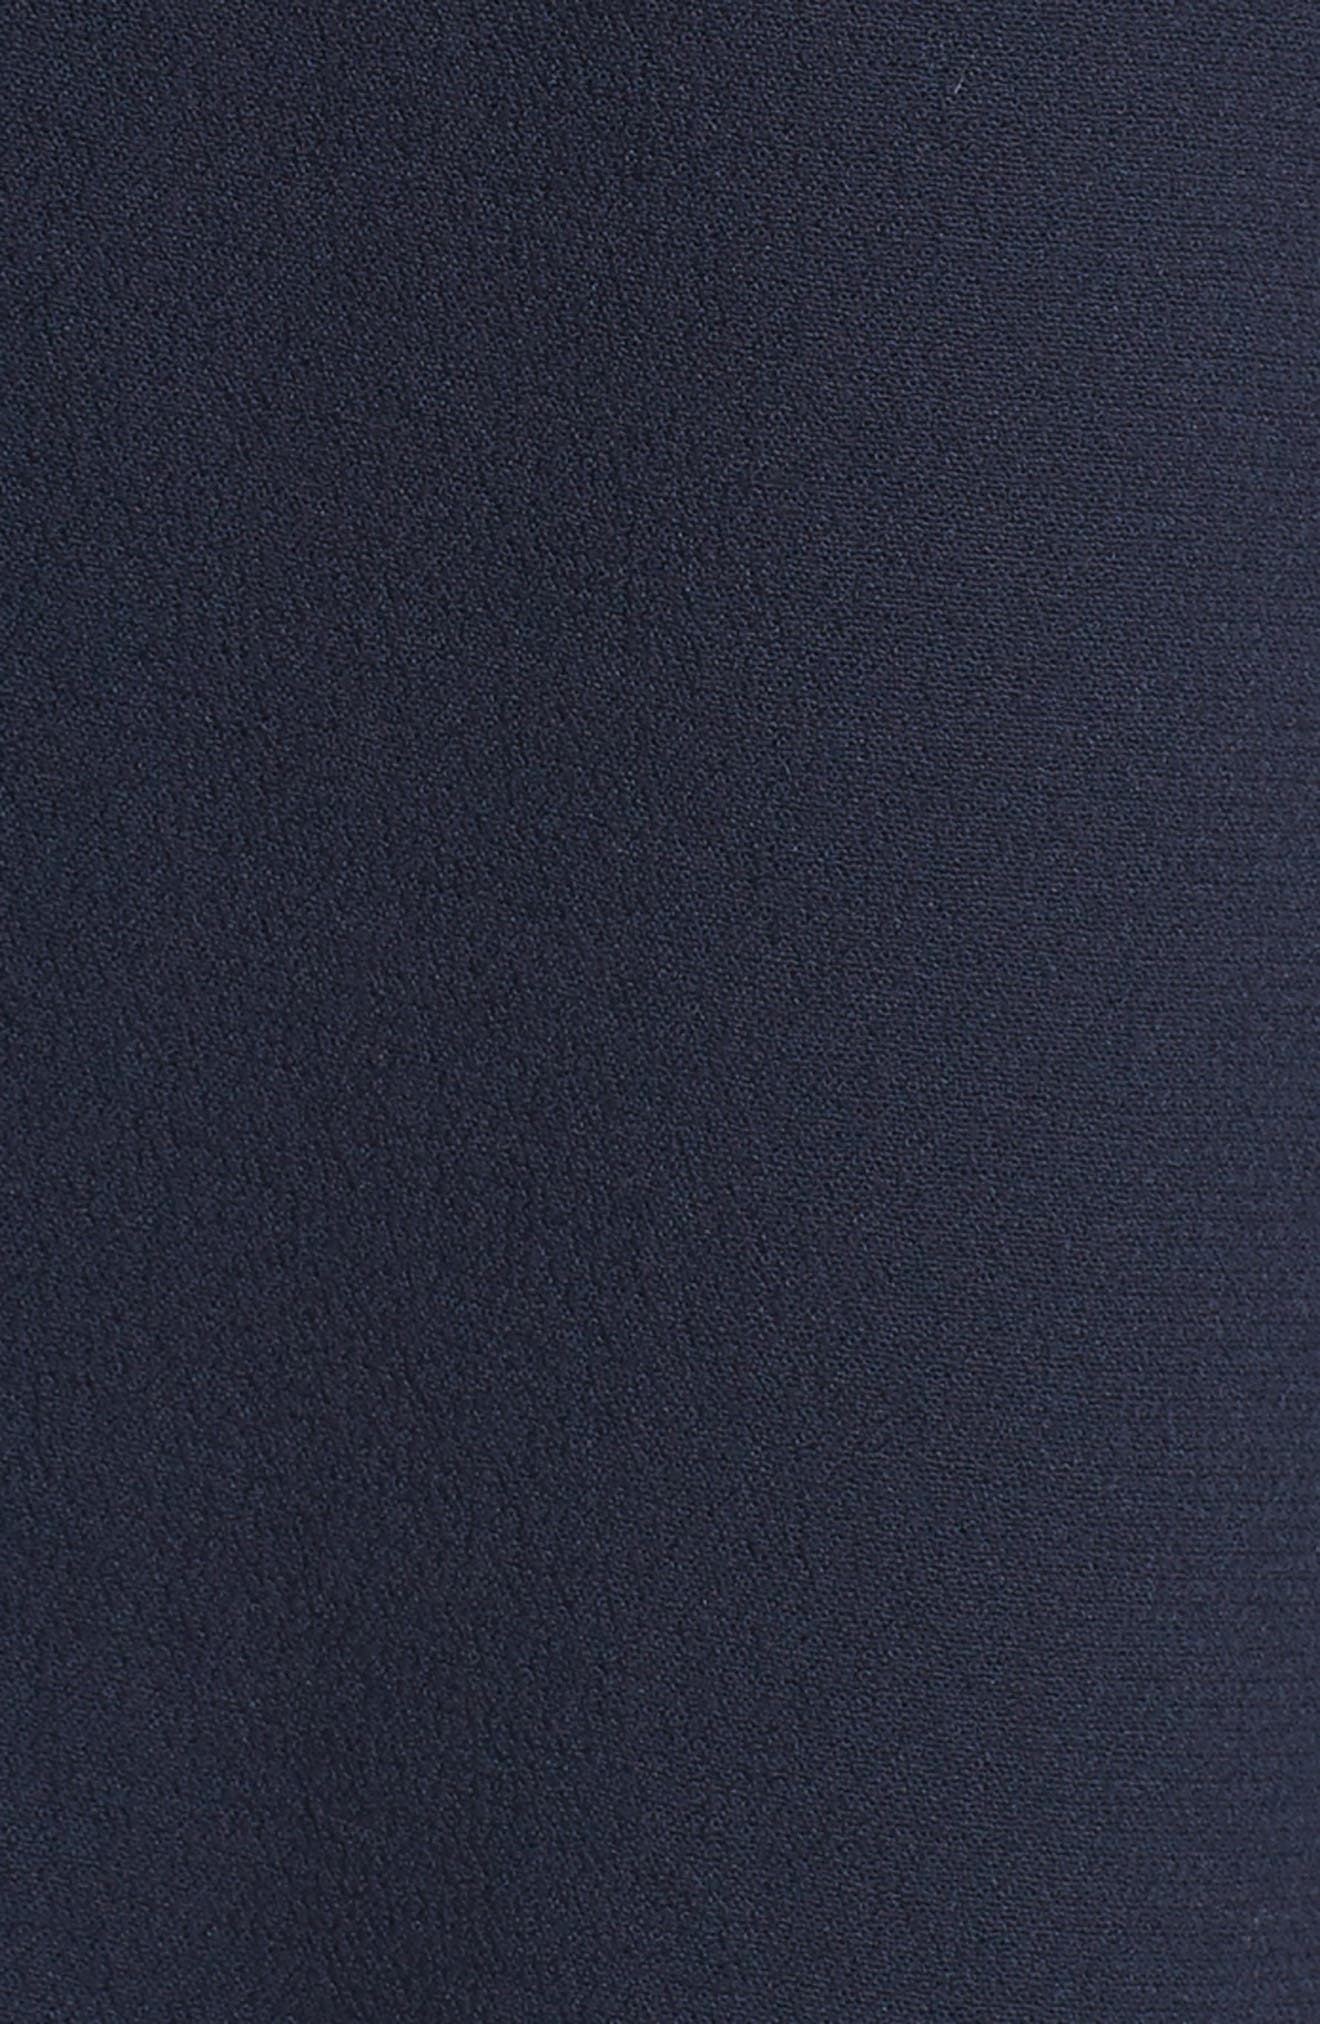 Ruffle Wrap Skirt,                             Alternate thumbnail 5, color,                             Navy Sapphire